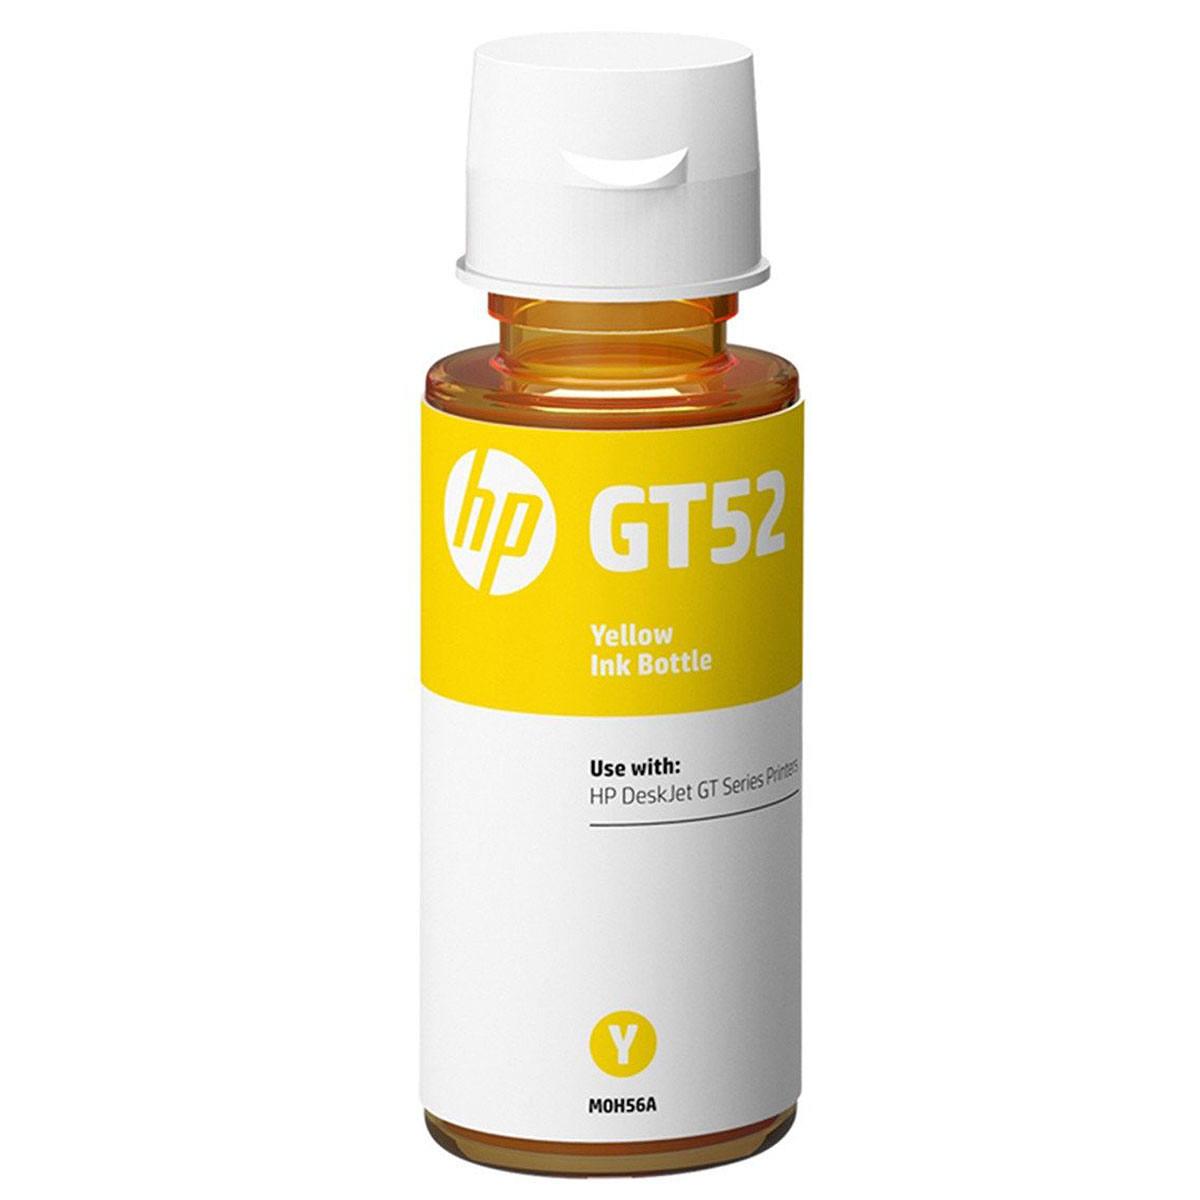 Tinta HP GT52 GT 52Y M0H56AL Original Amarela para HP Deskjet GT 5822 416 116 Smart Tank 517 532 617 Garrafa de 70ml